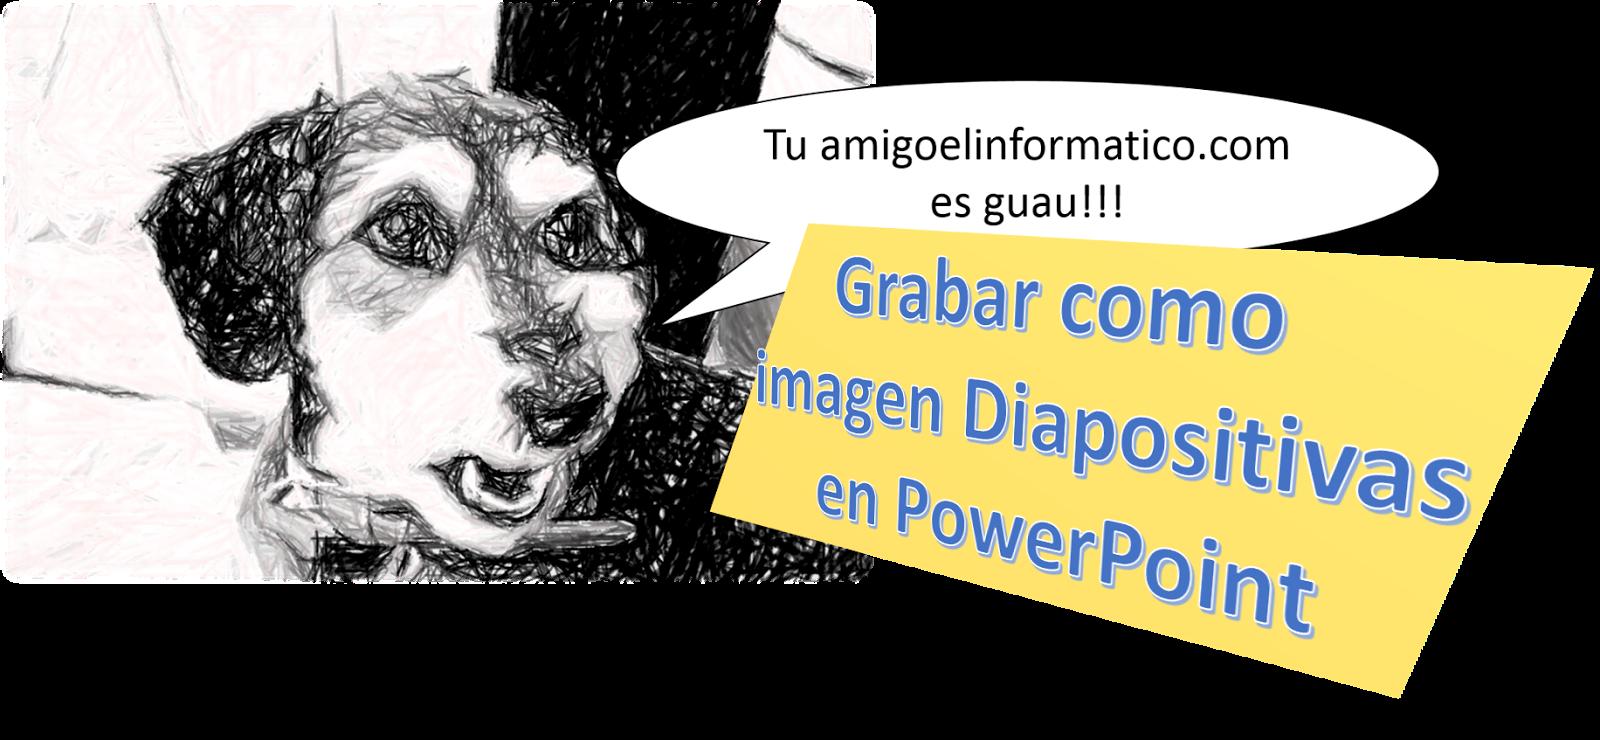 Guardar como imágenes diapositivas de PowerPoint